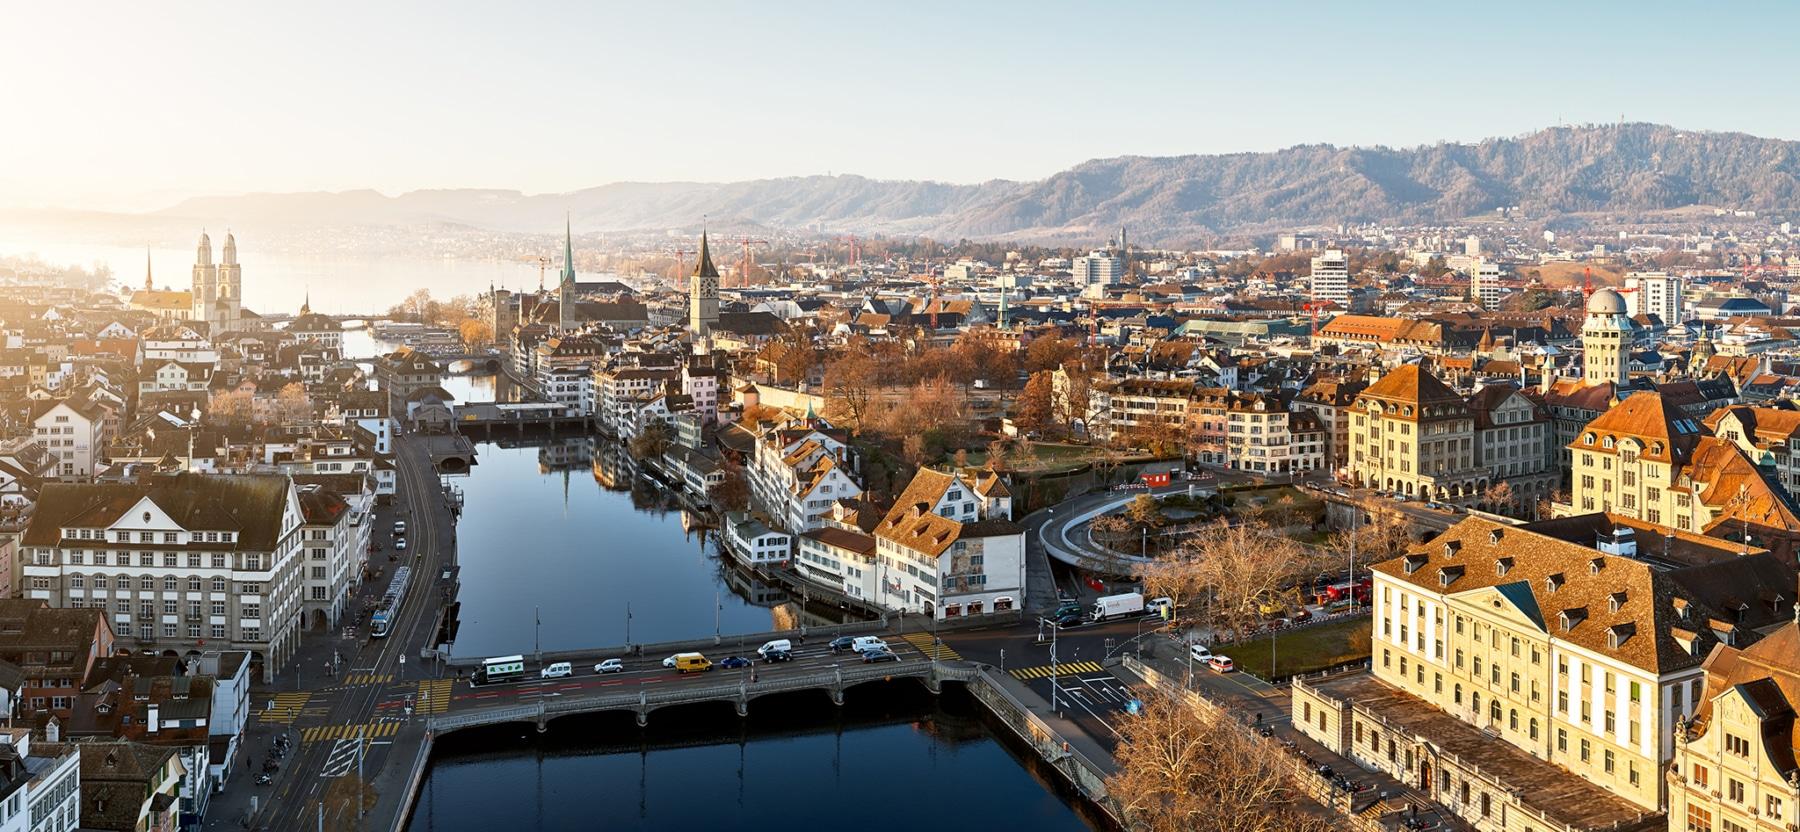 Luftaufnahme Stadt Zürich - Rudolf-Brun-Brücke, Urania, Rathausbrücke, Münsterbrücke, Quaibrücke, Zürichsee - max 15000px